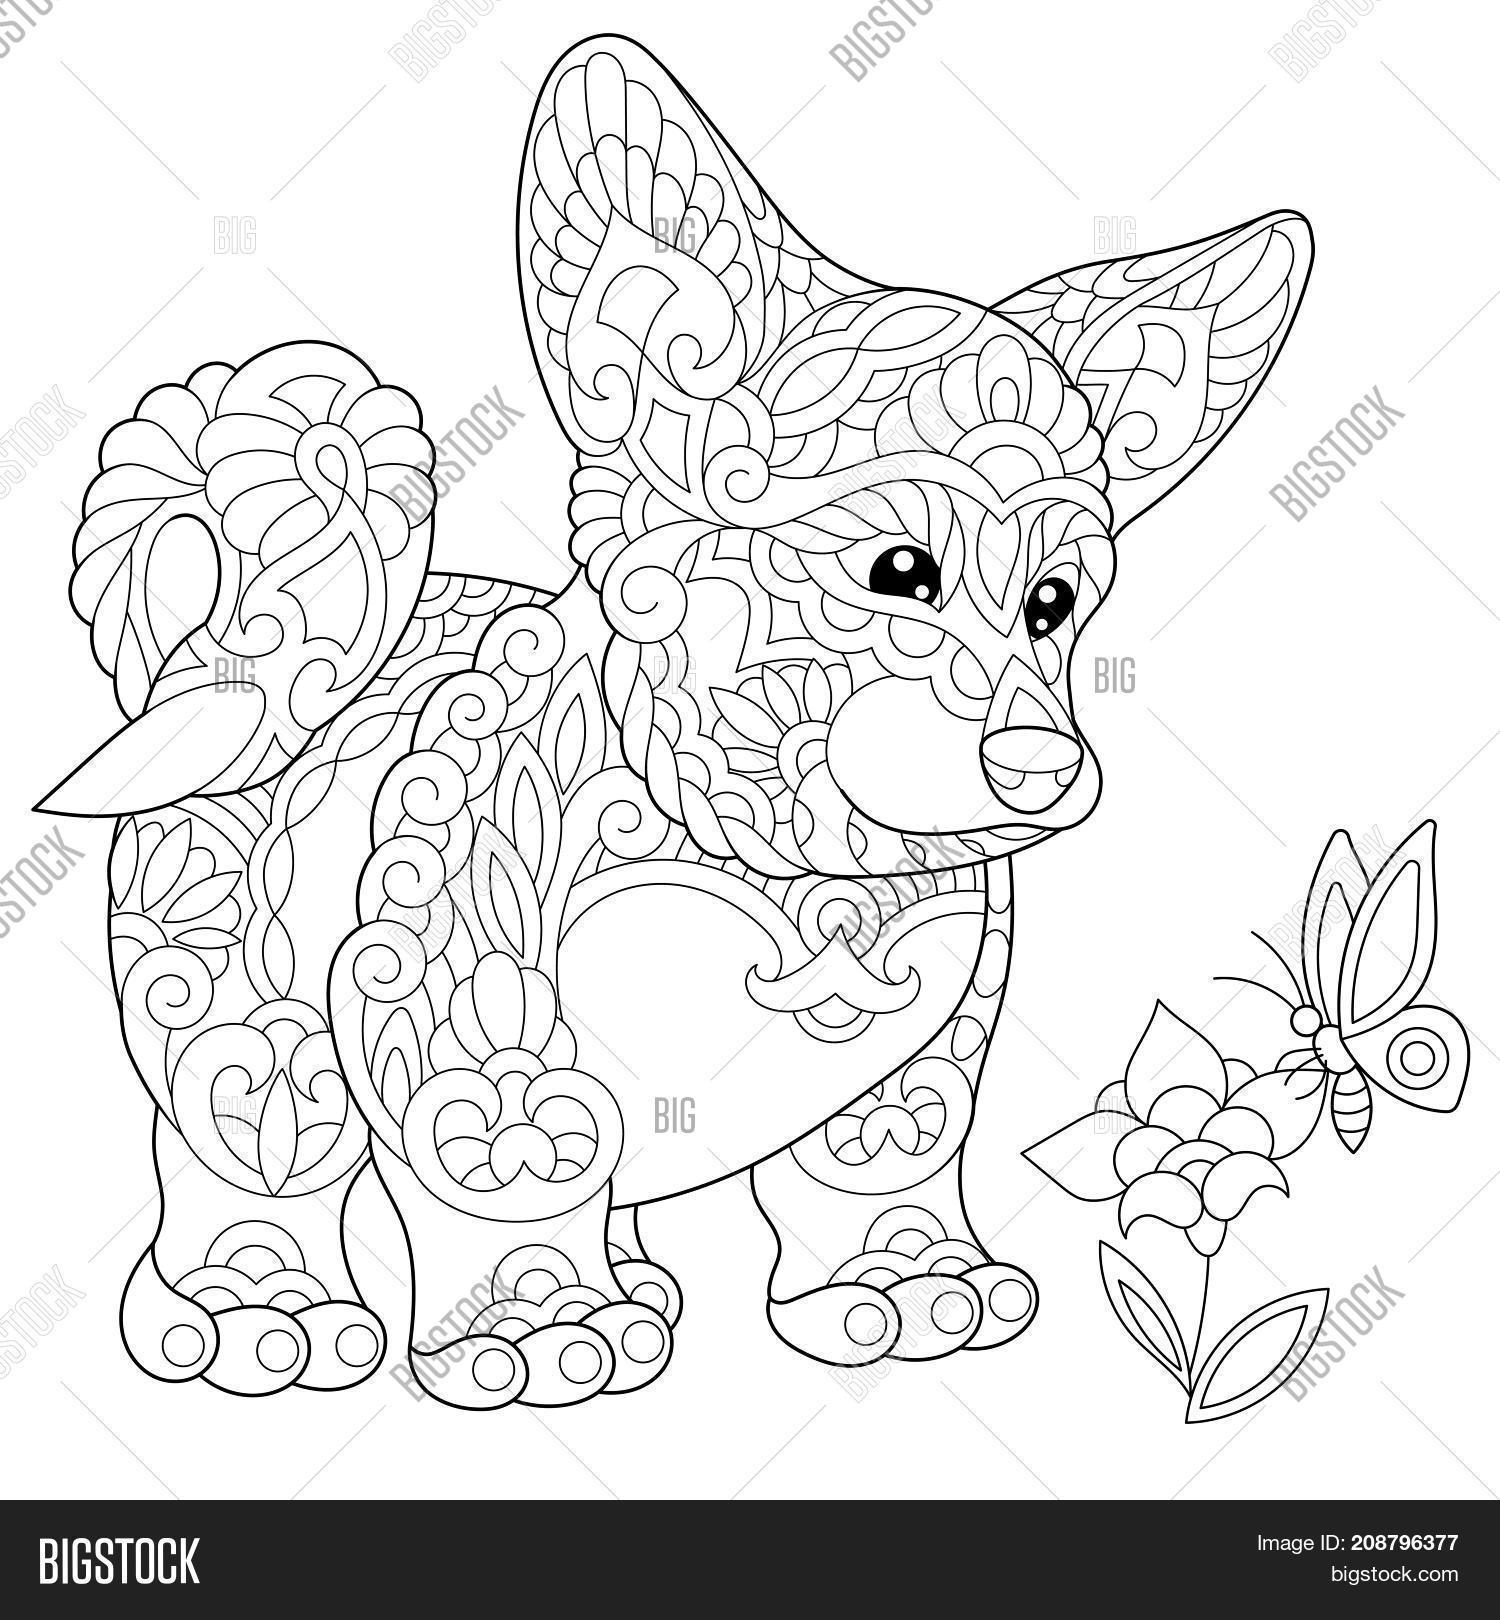 corgi coloring pages - coloring page welsh corgi dog image photo bigstock